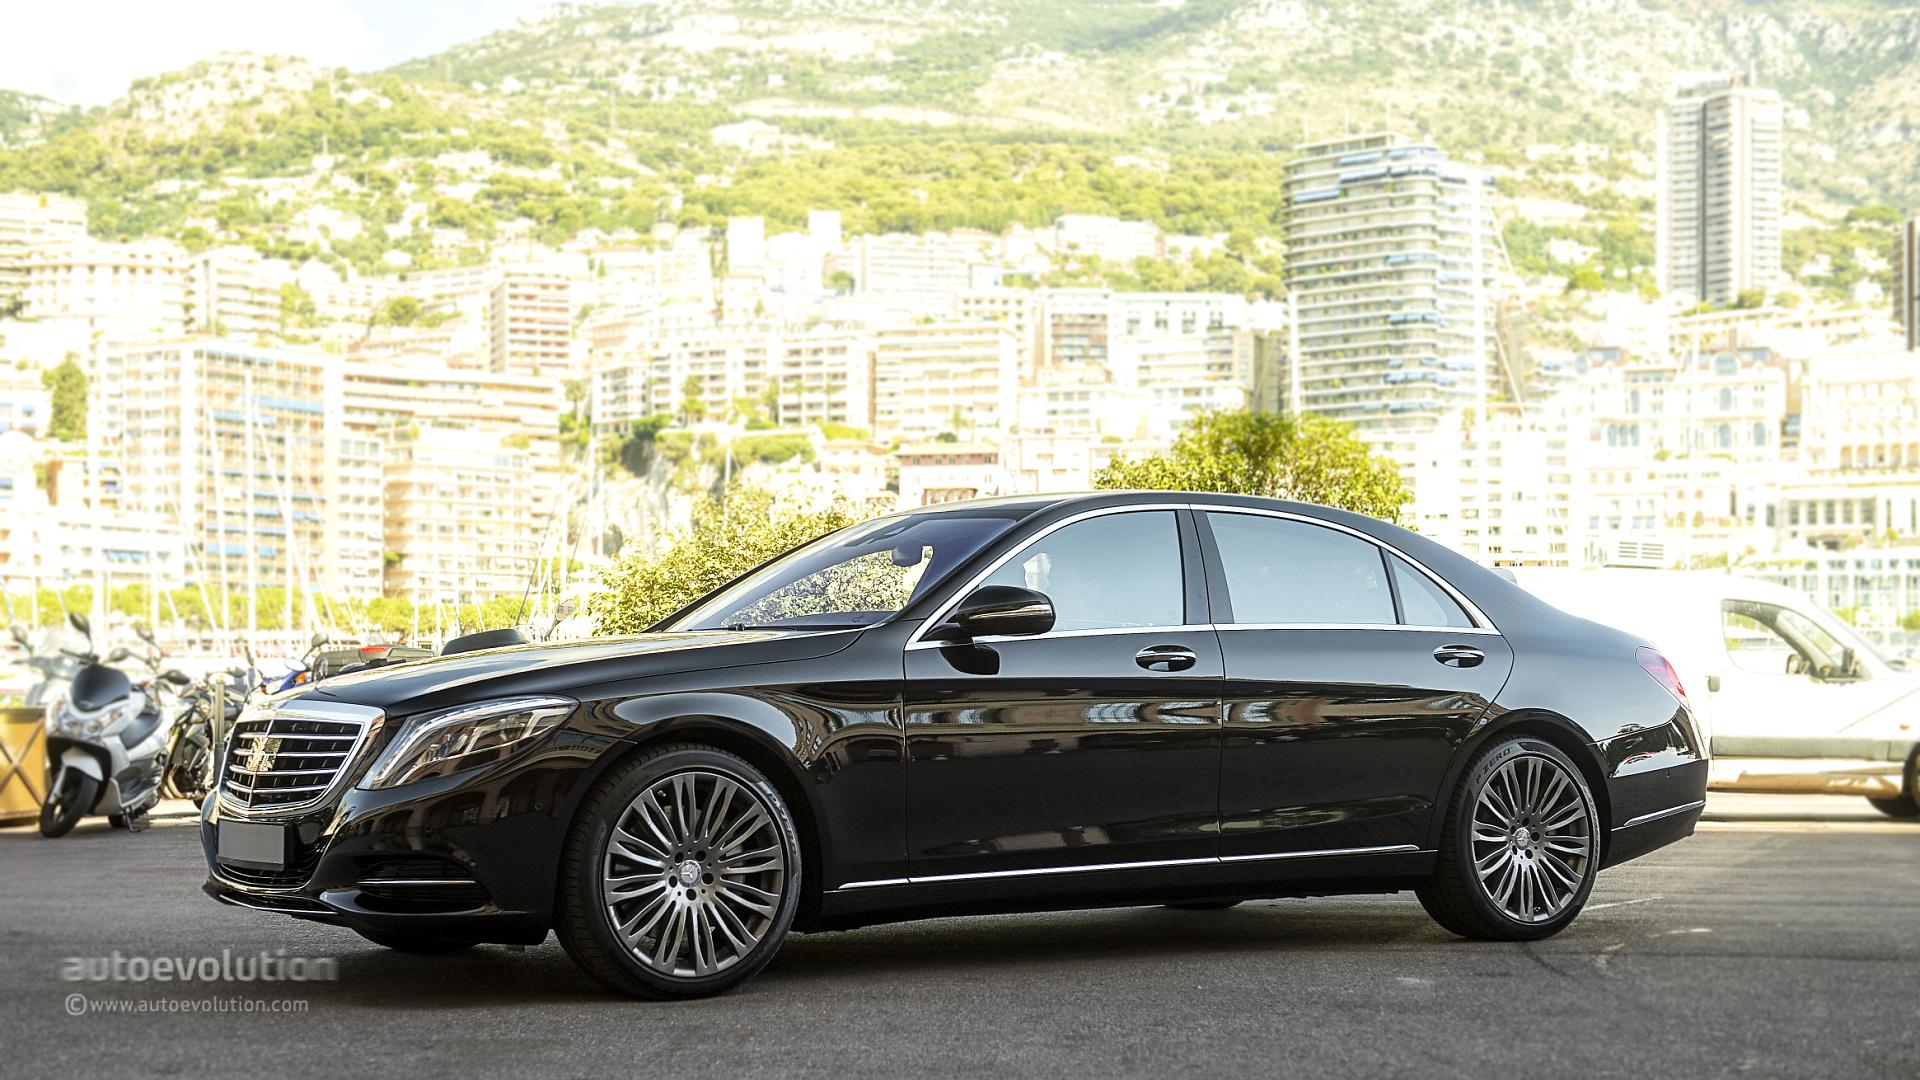 2014 mercedes benz s500 long review autoevolution for Mercedes benz s500 2014